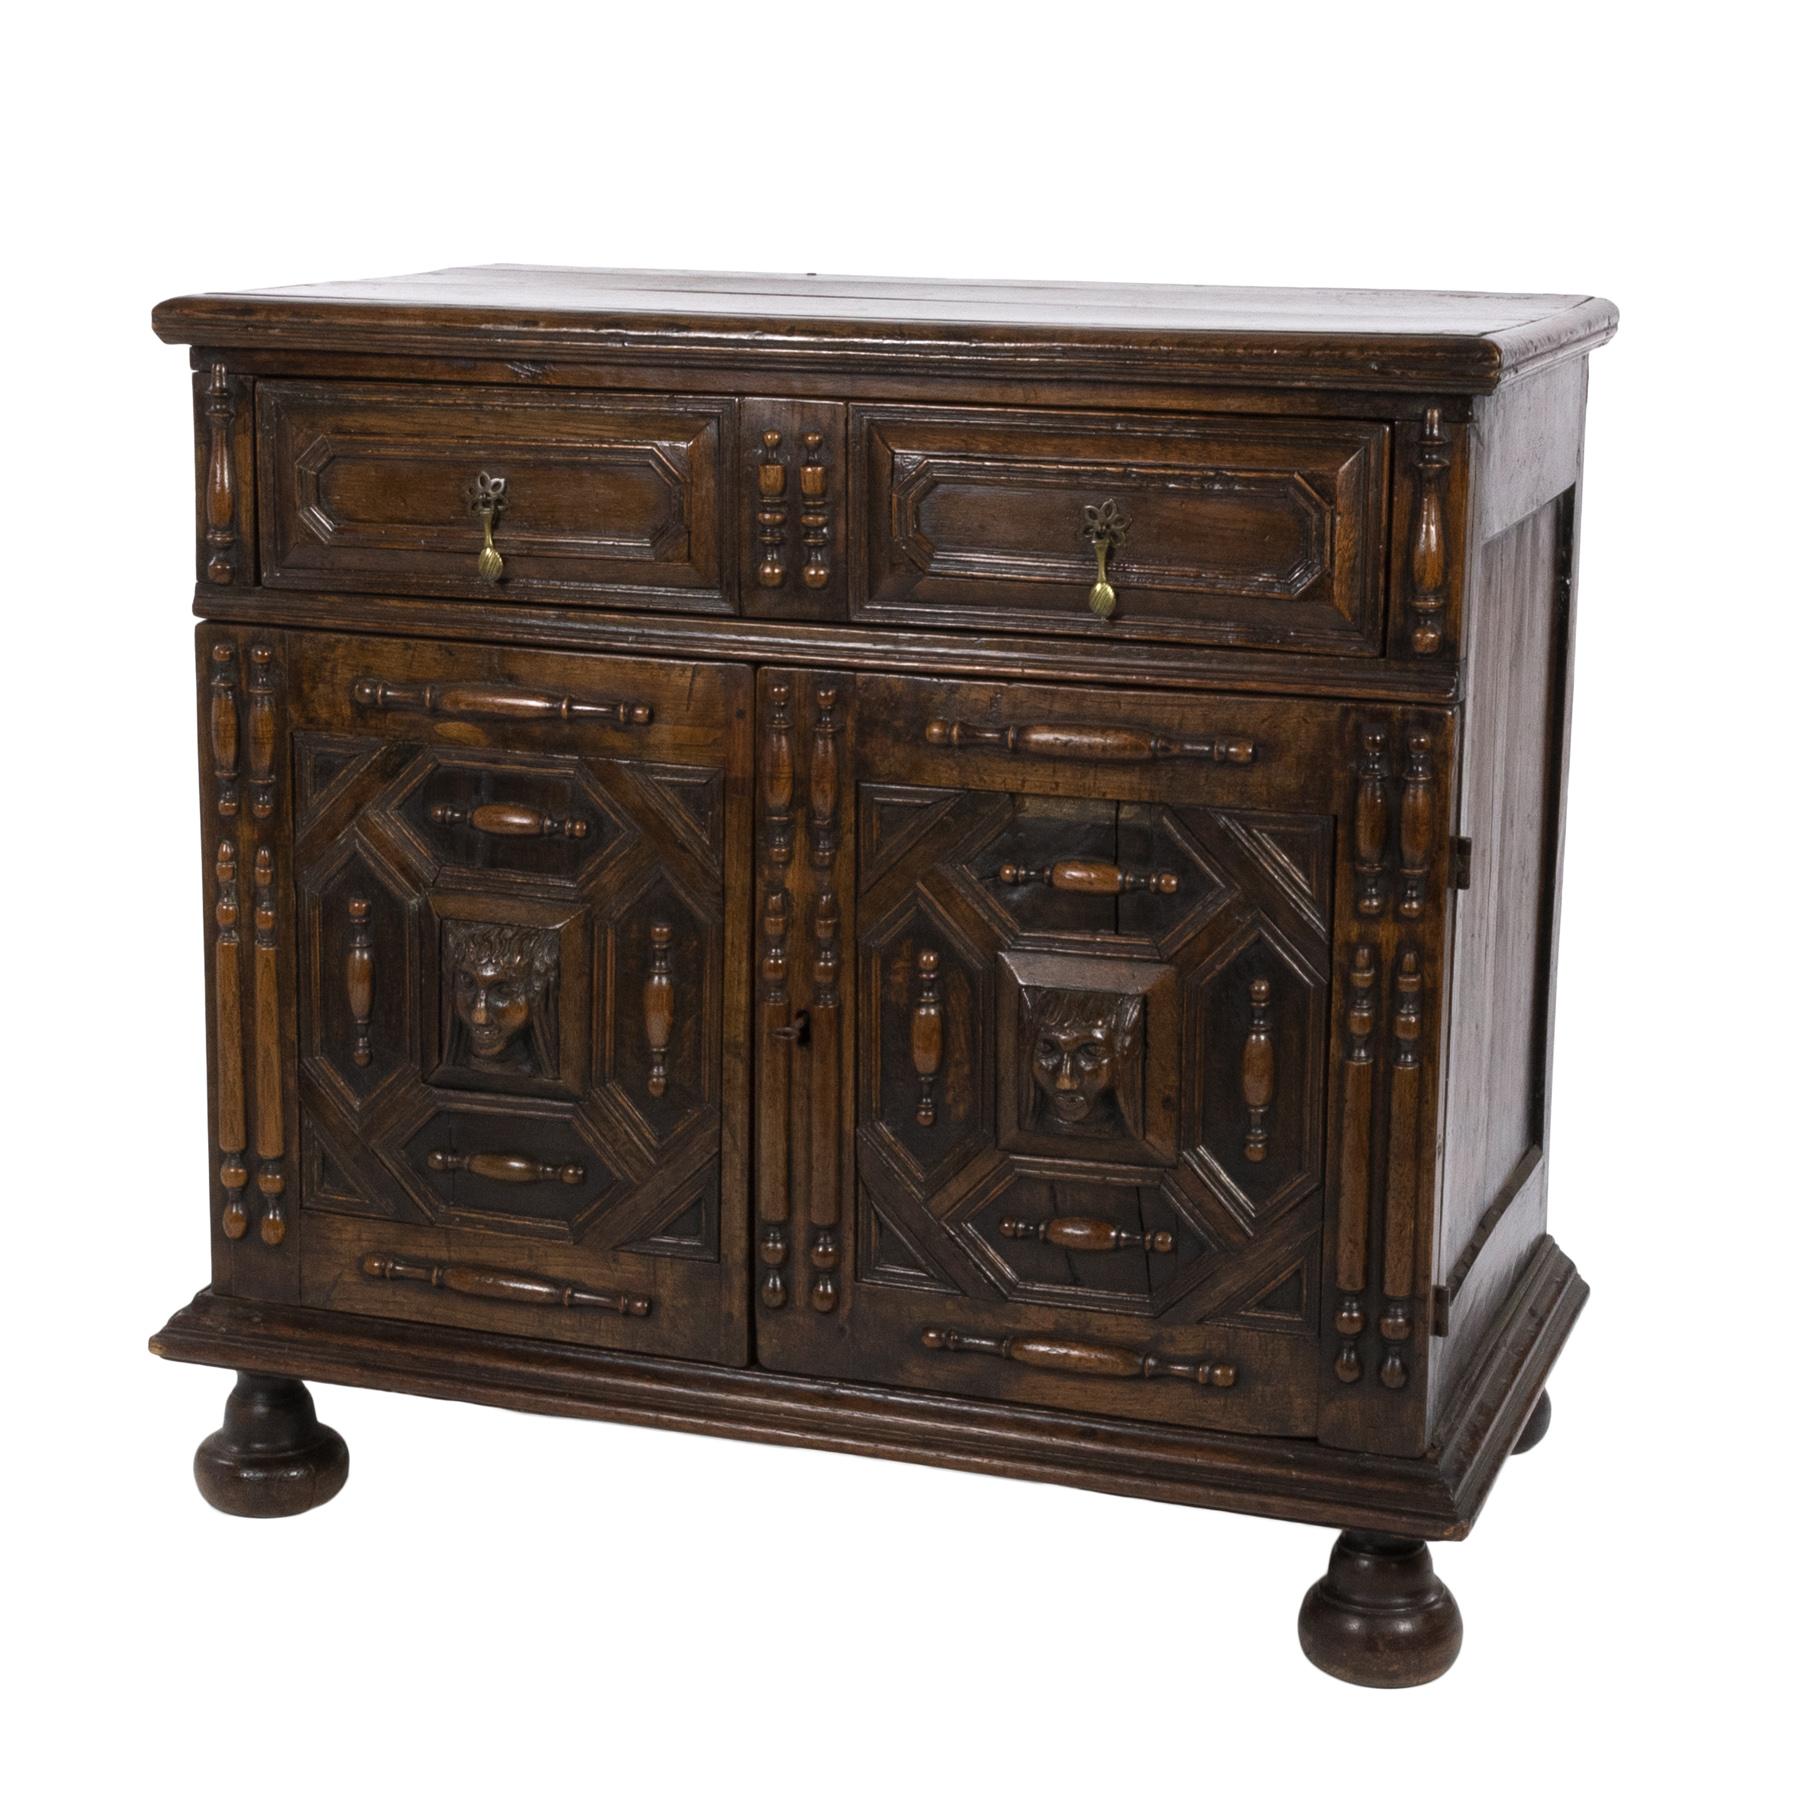 18th Century American Furniture Construction: Late 17th / Early 18th Century Oak Dutch Cupboard (415